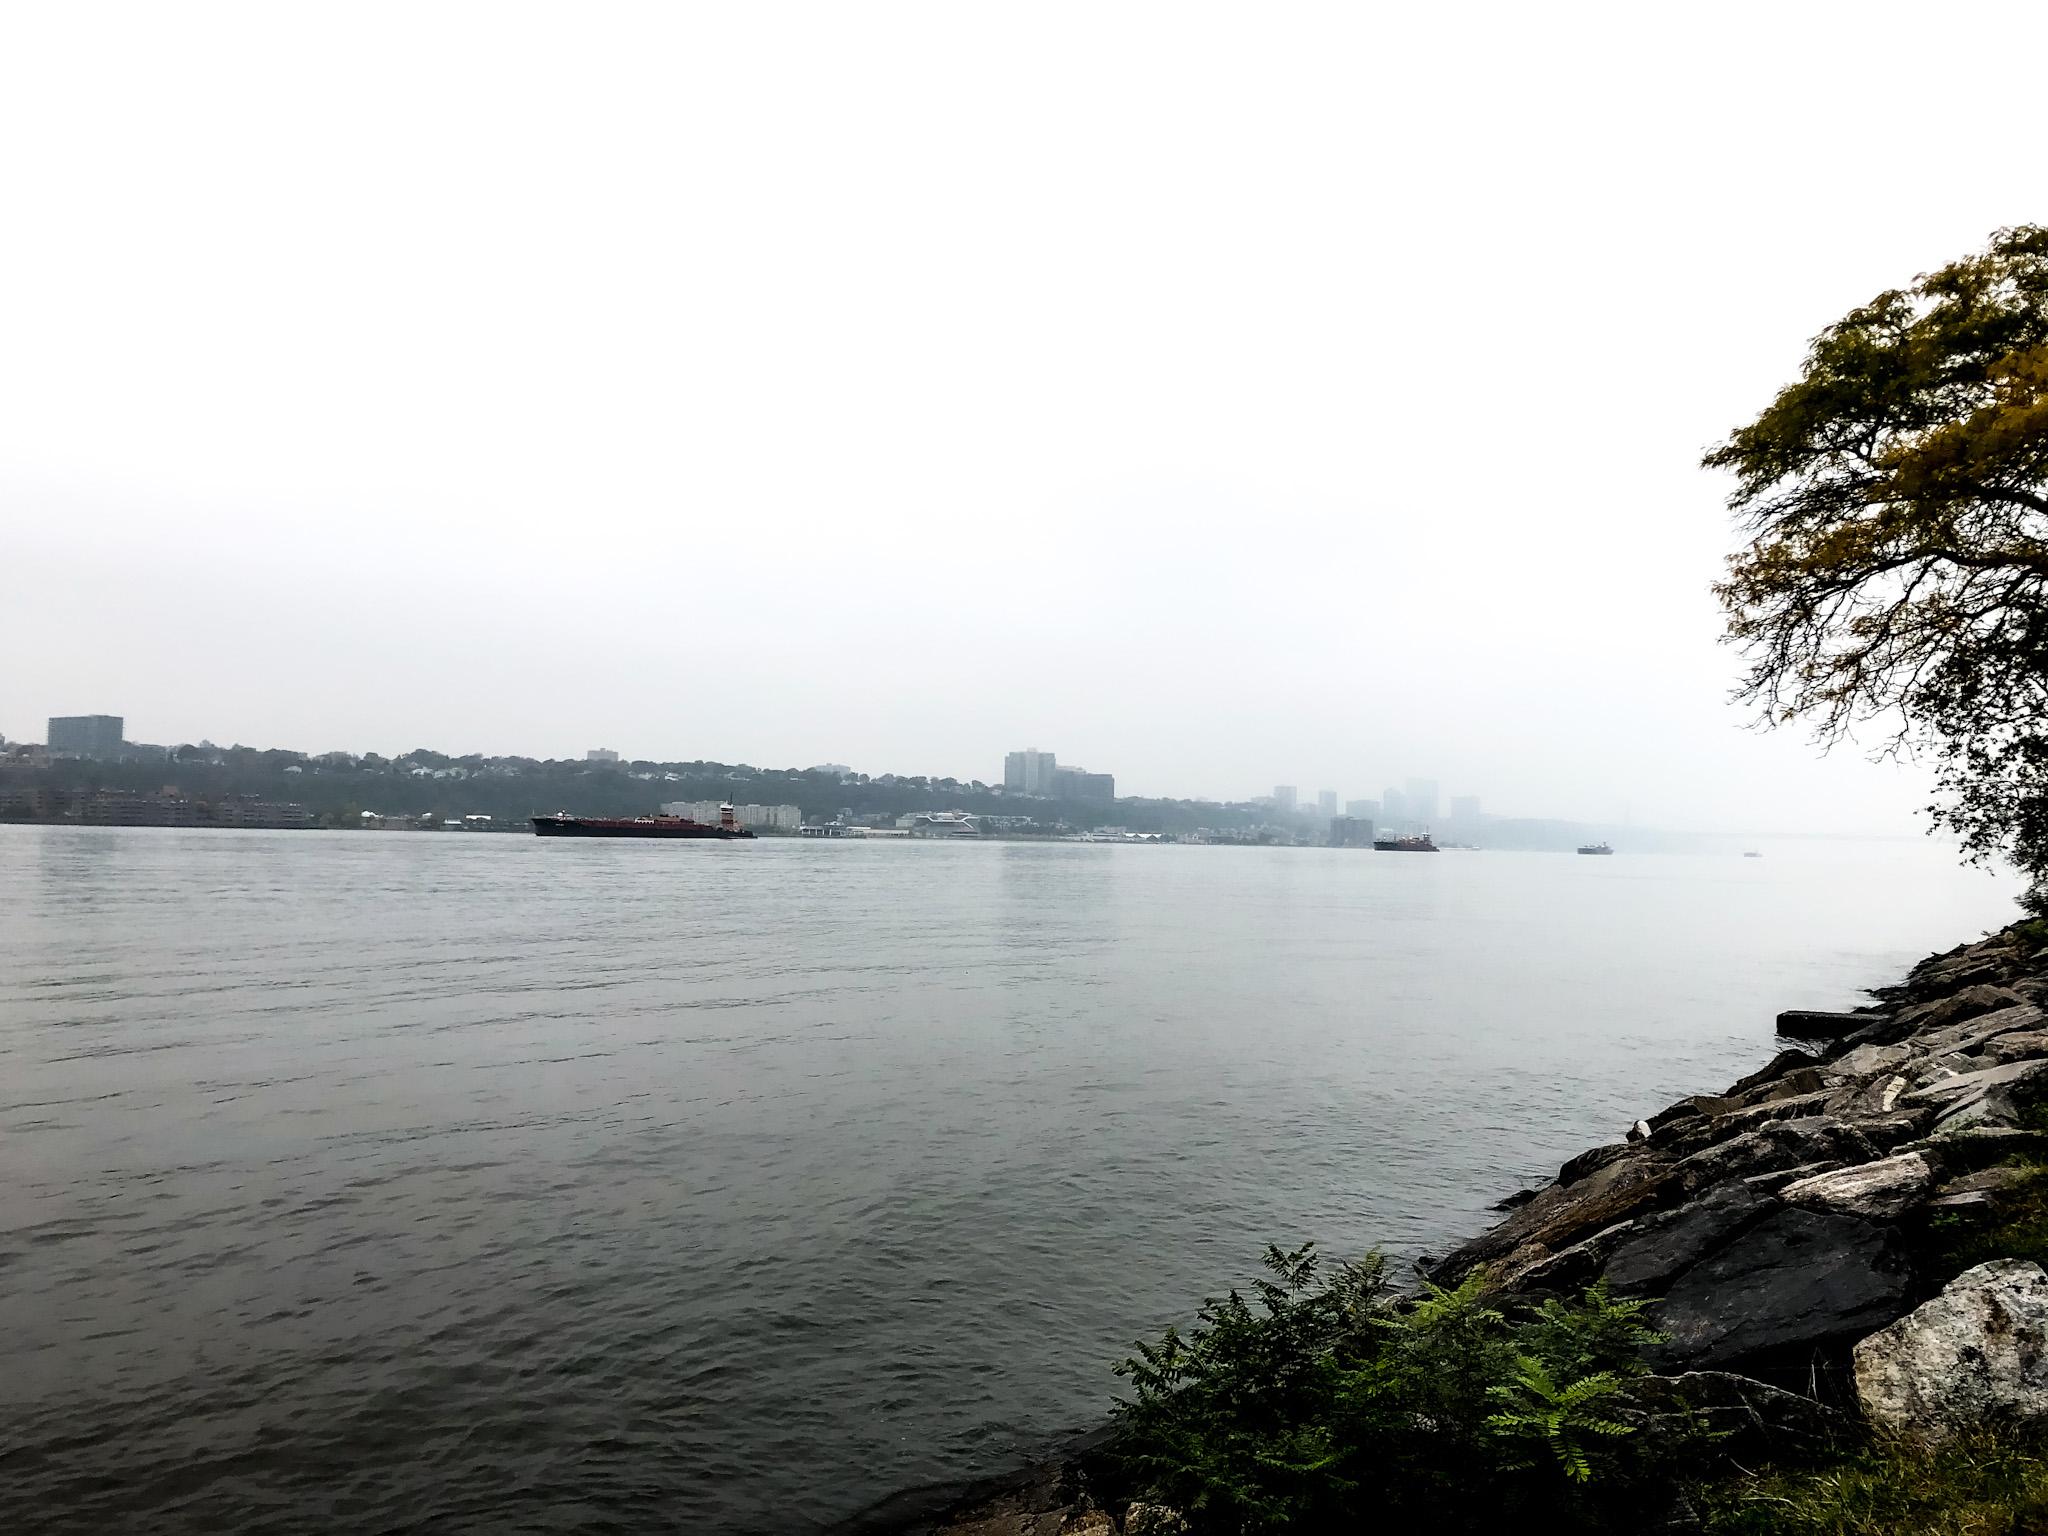 A Hazy Day inNYC